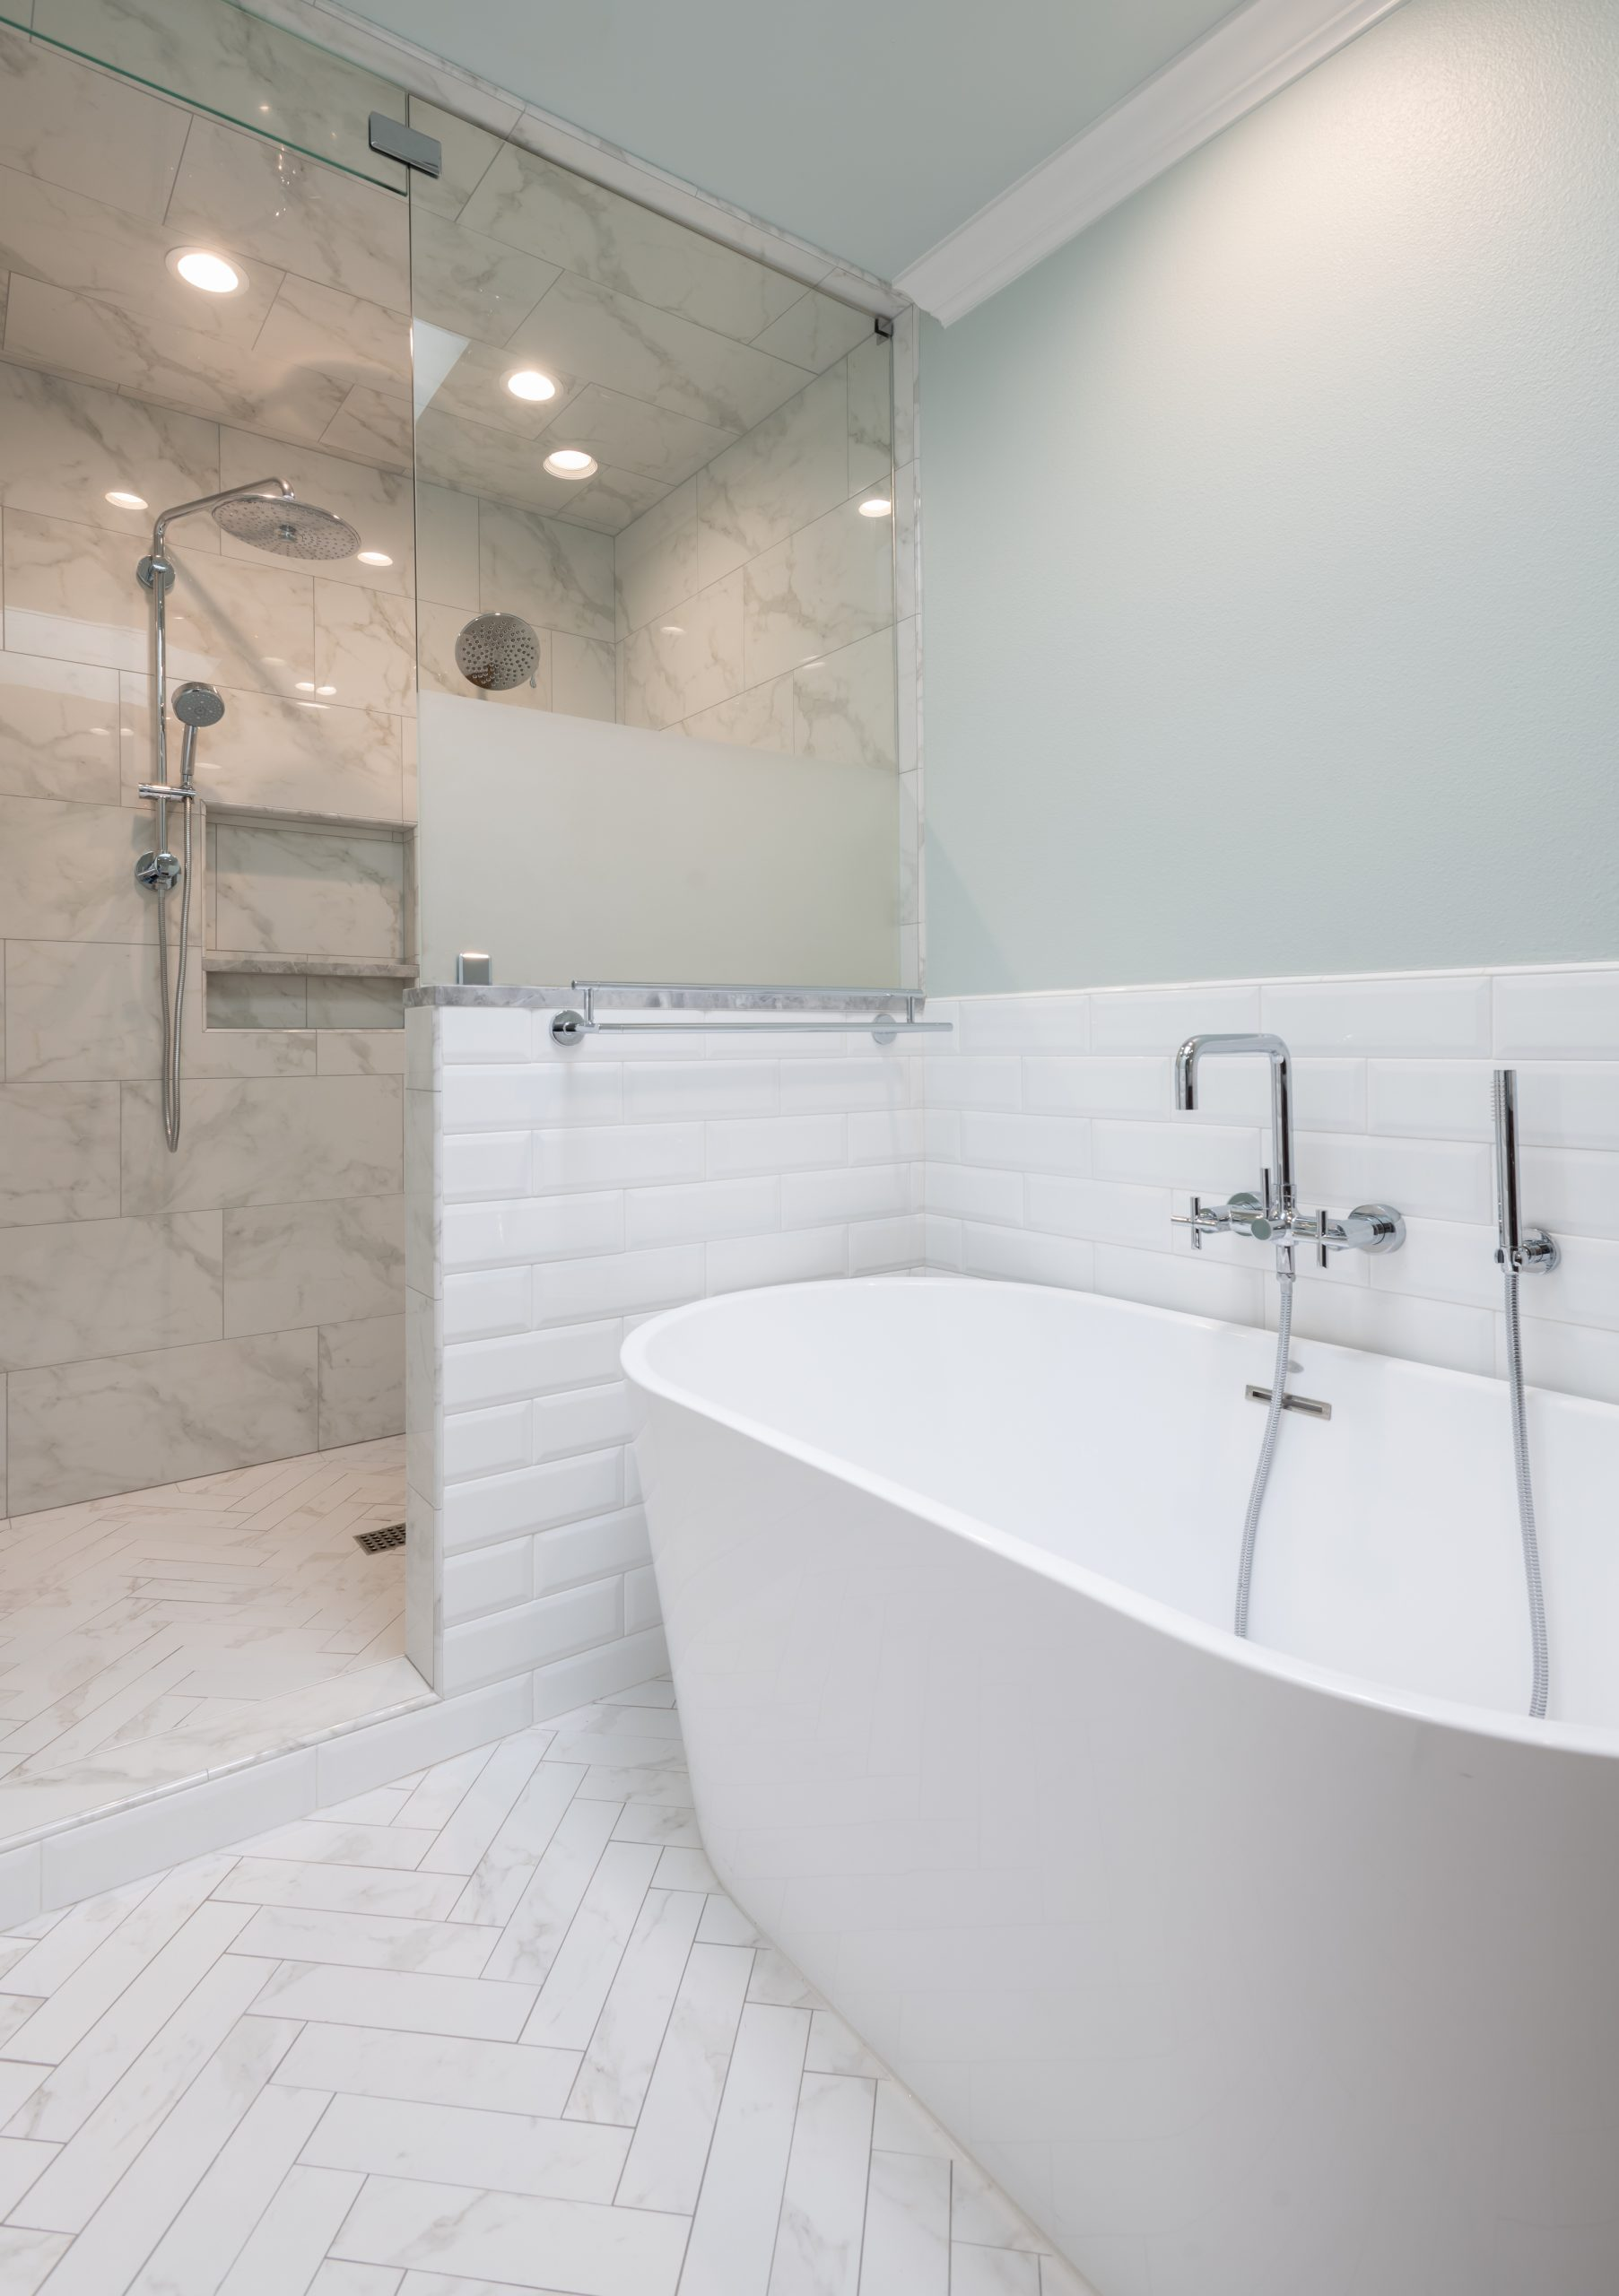 shower entrance in bathroom remodel in dallas tx